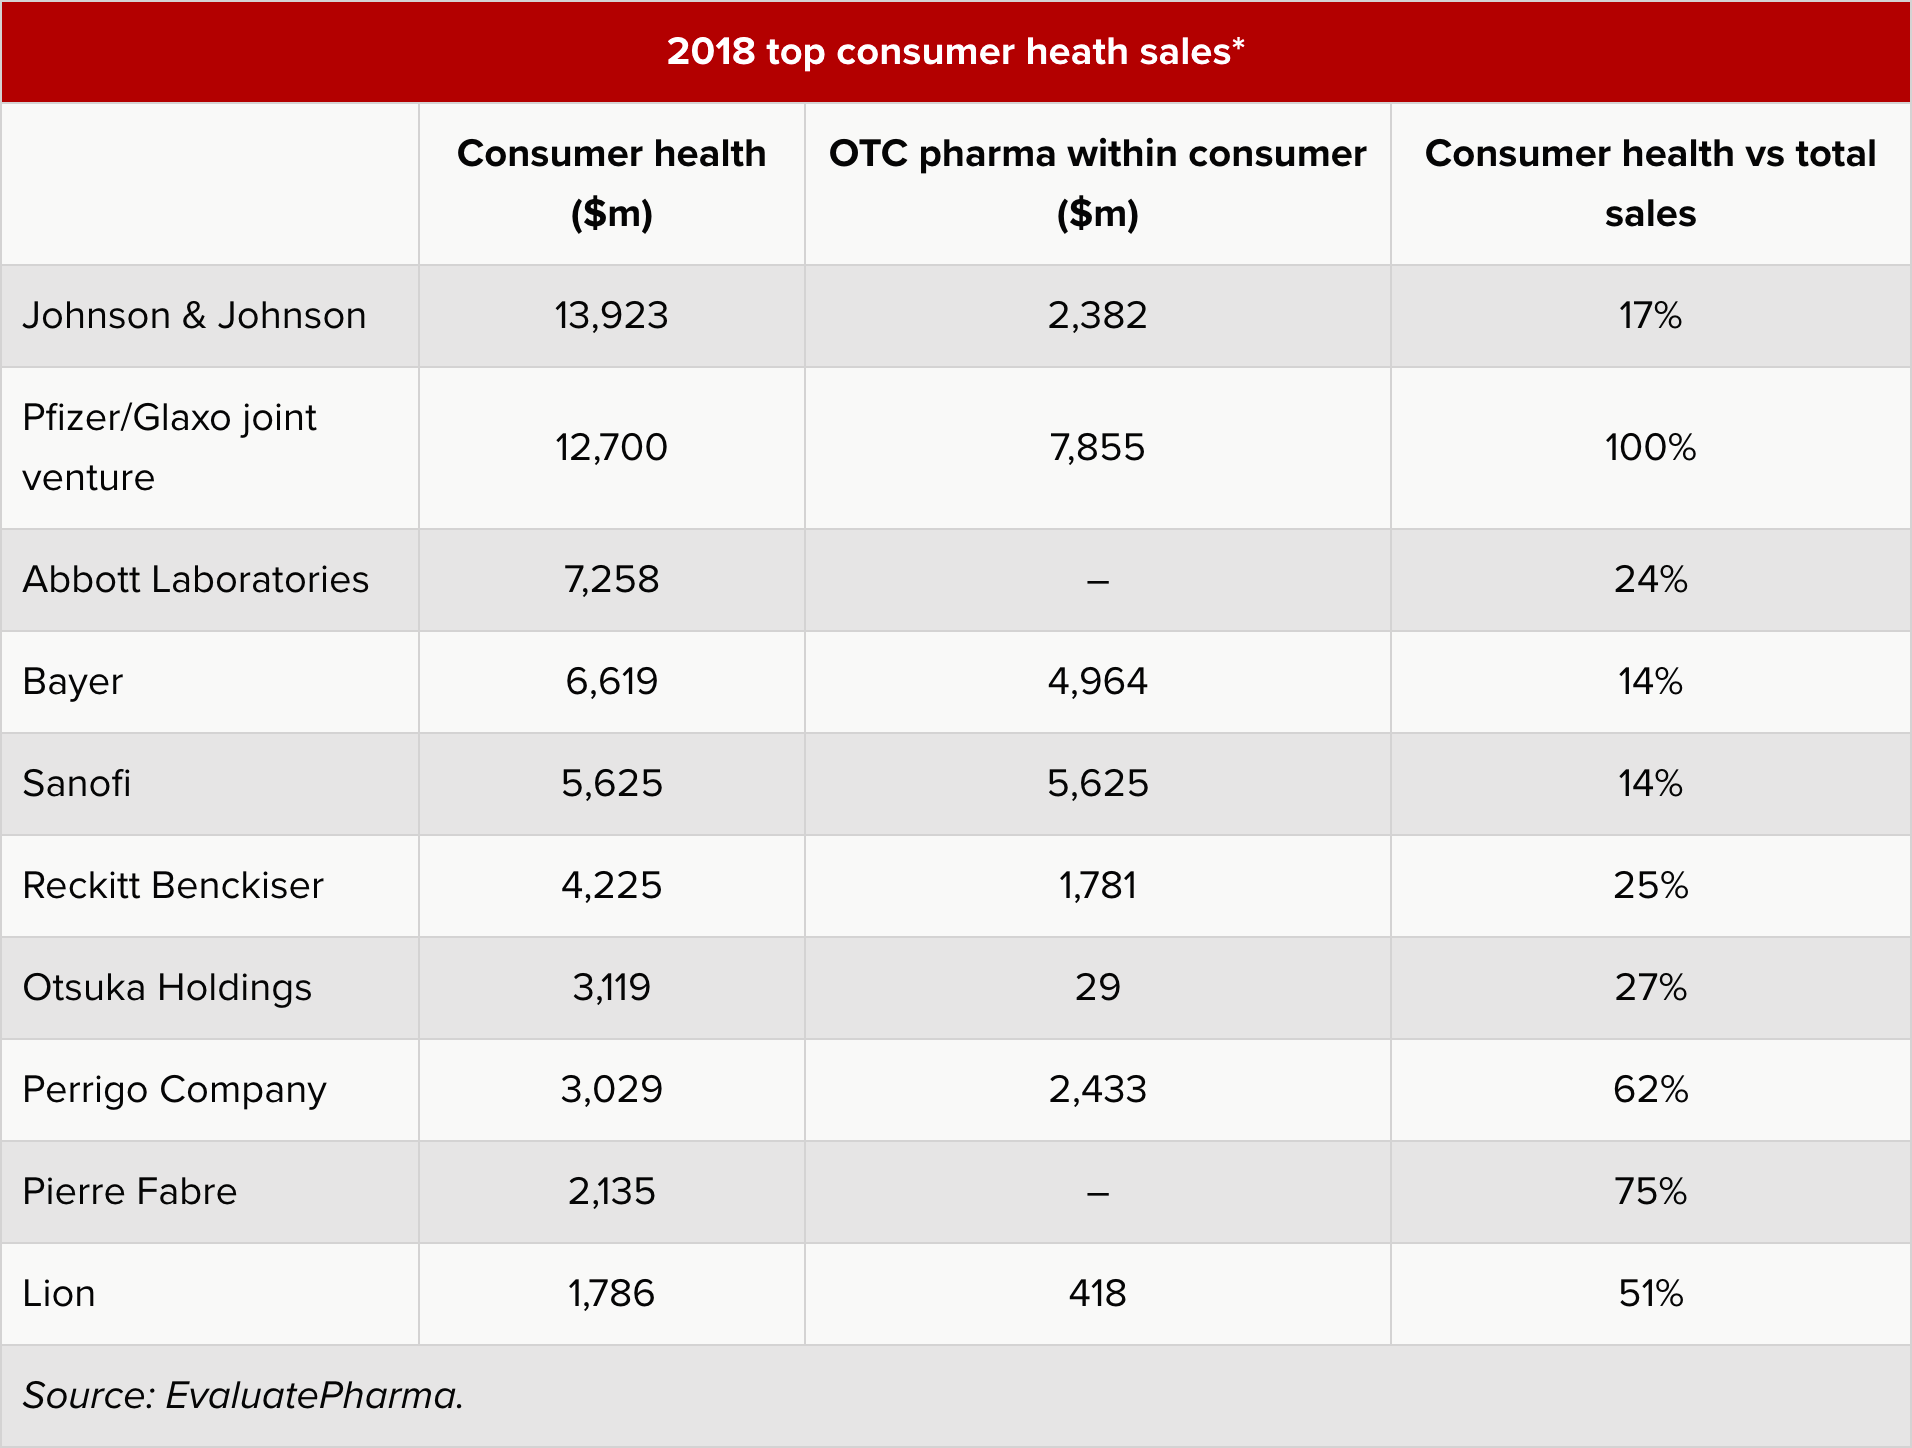 2018 top consumer heath sales - GlaxoSmithKline и Pfizer объединят потребительские и безрецептурные бизнесы